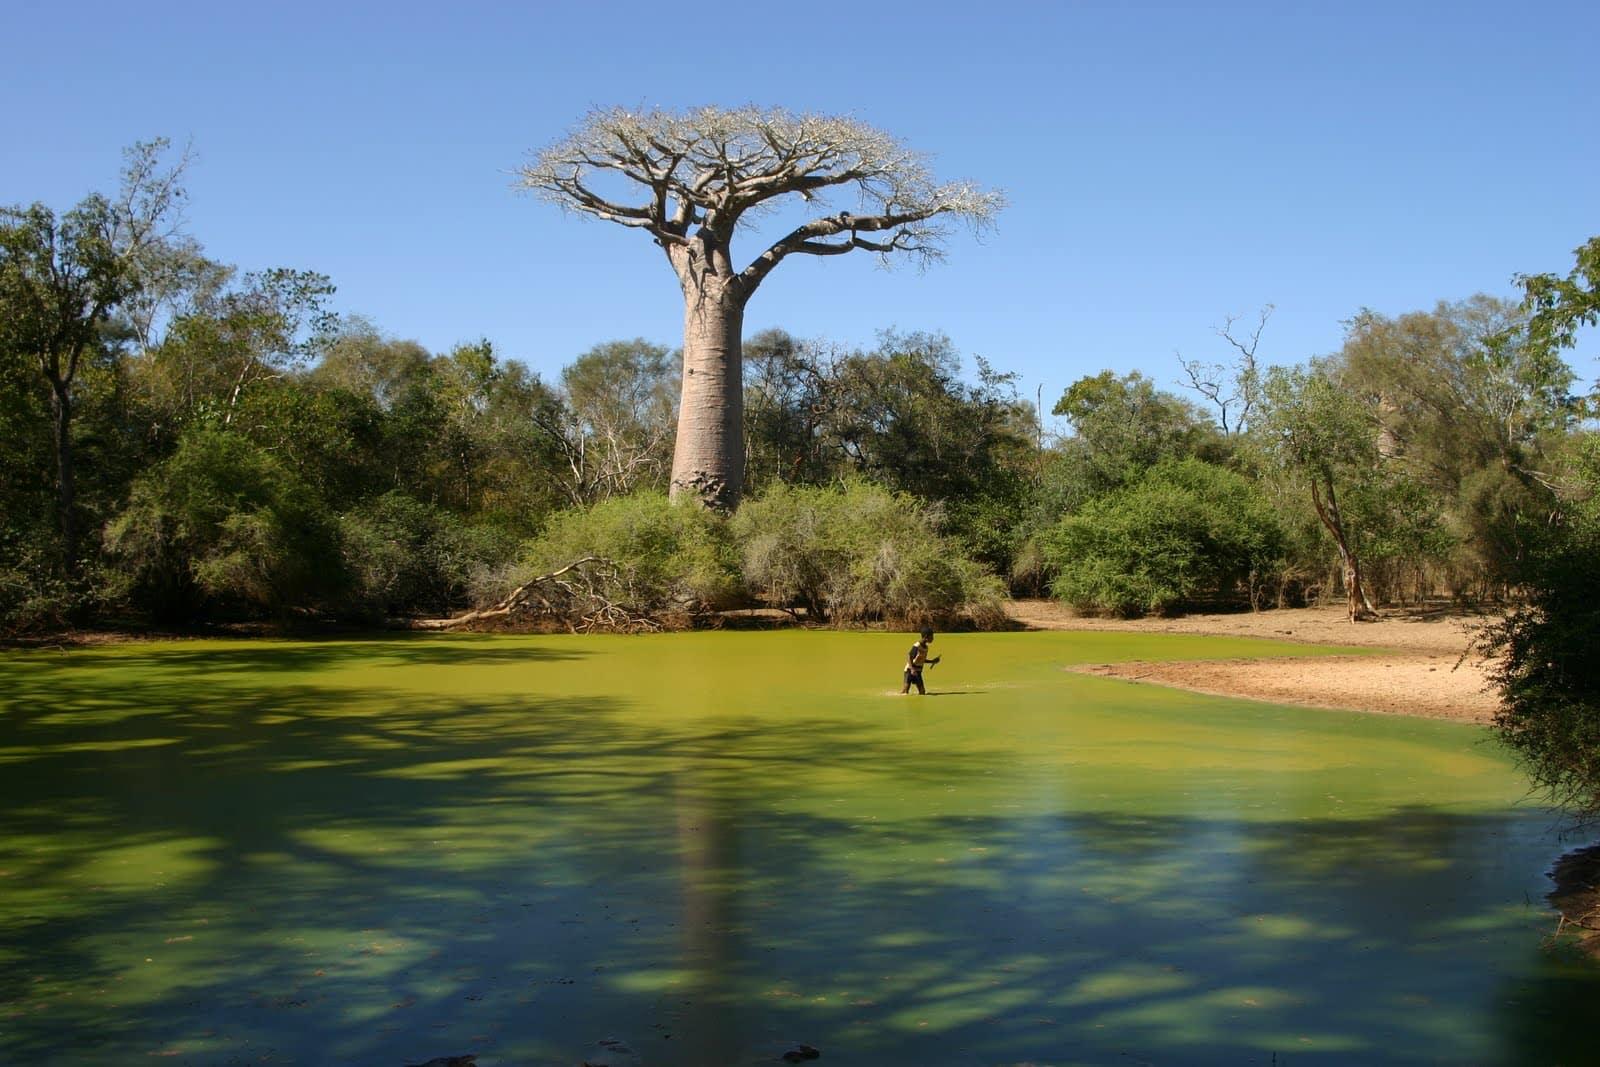 Baobab trees - unique scenery in Madagascar - China.org.cn